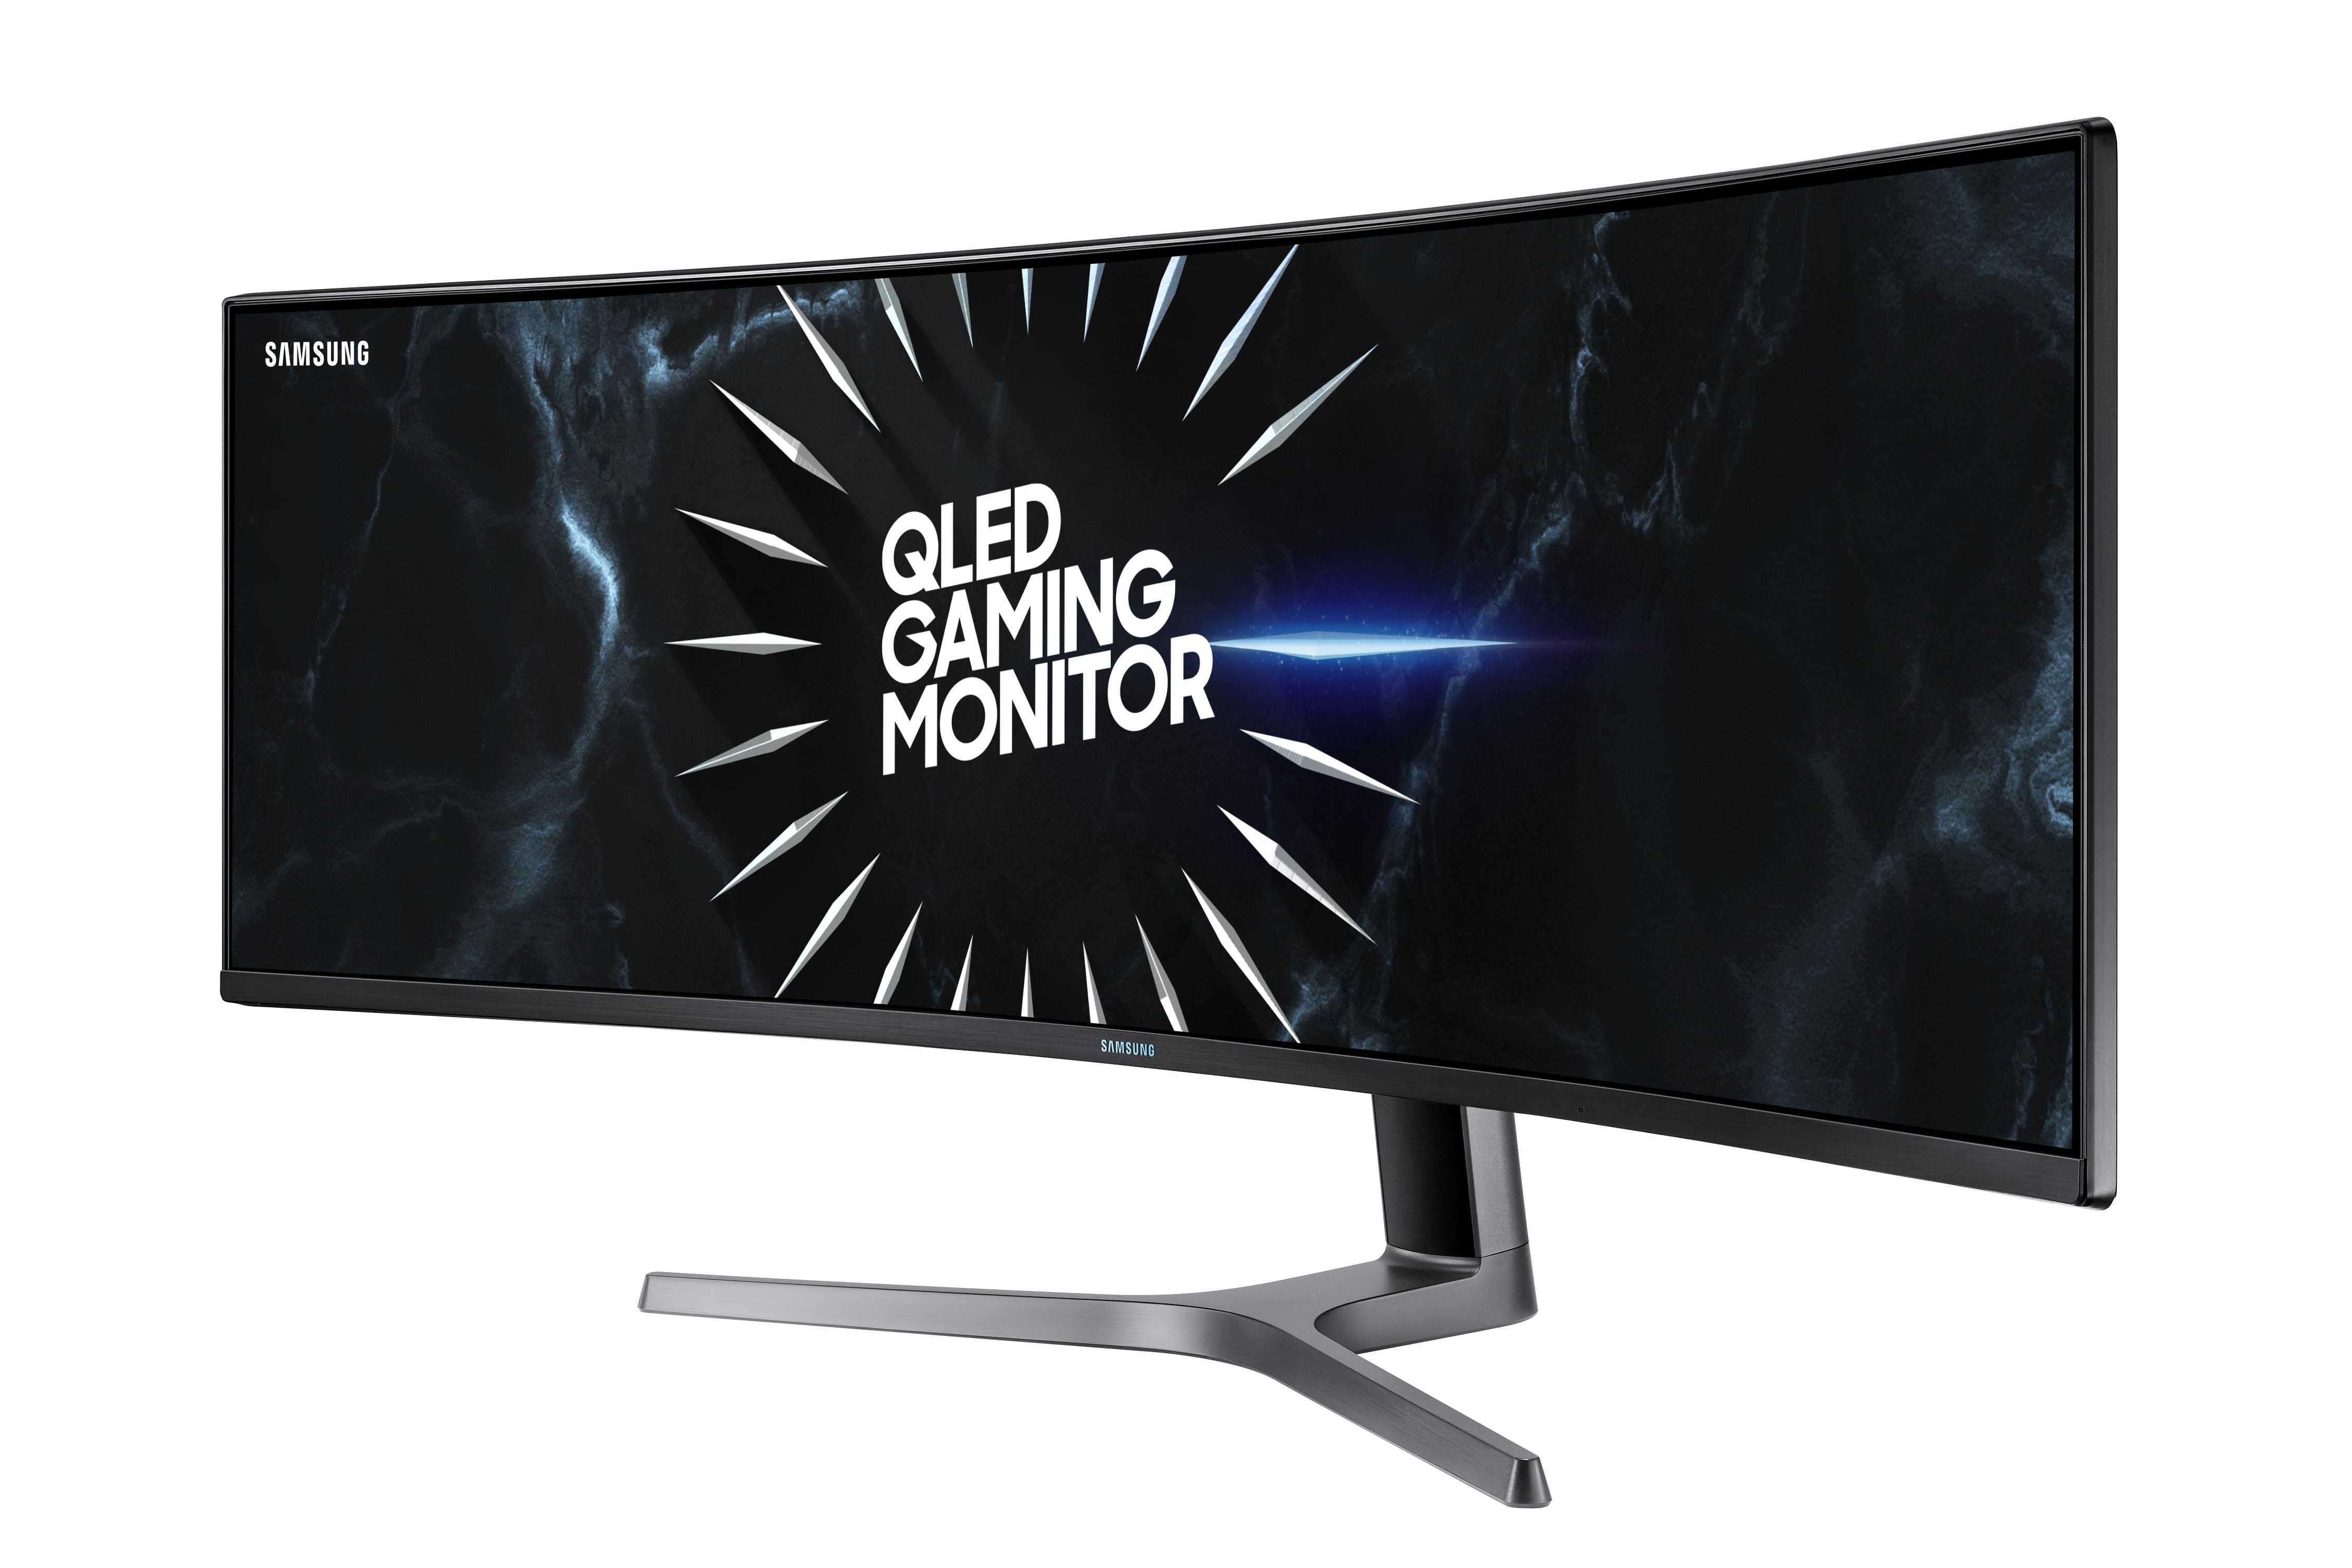 49 inch CRG9 Dual QHD Curved QLED Gaming Monitor Monitors